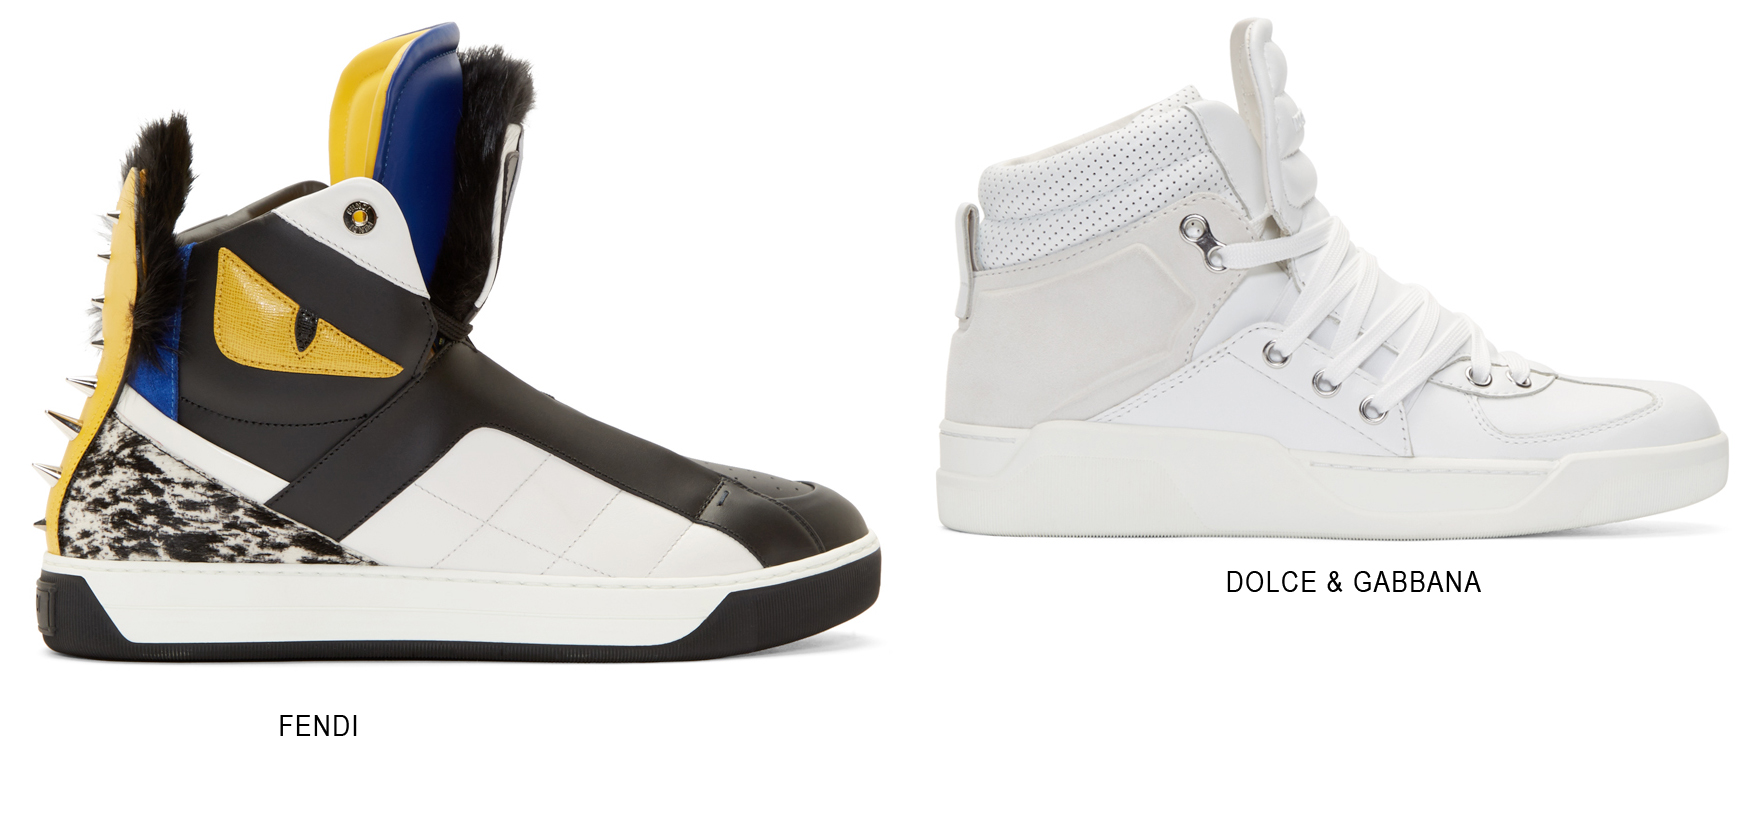 dolcegabbana-fendi-sneakers